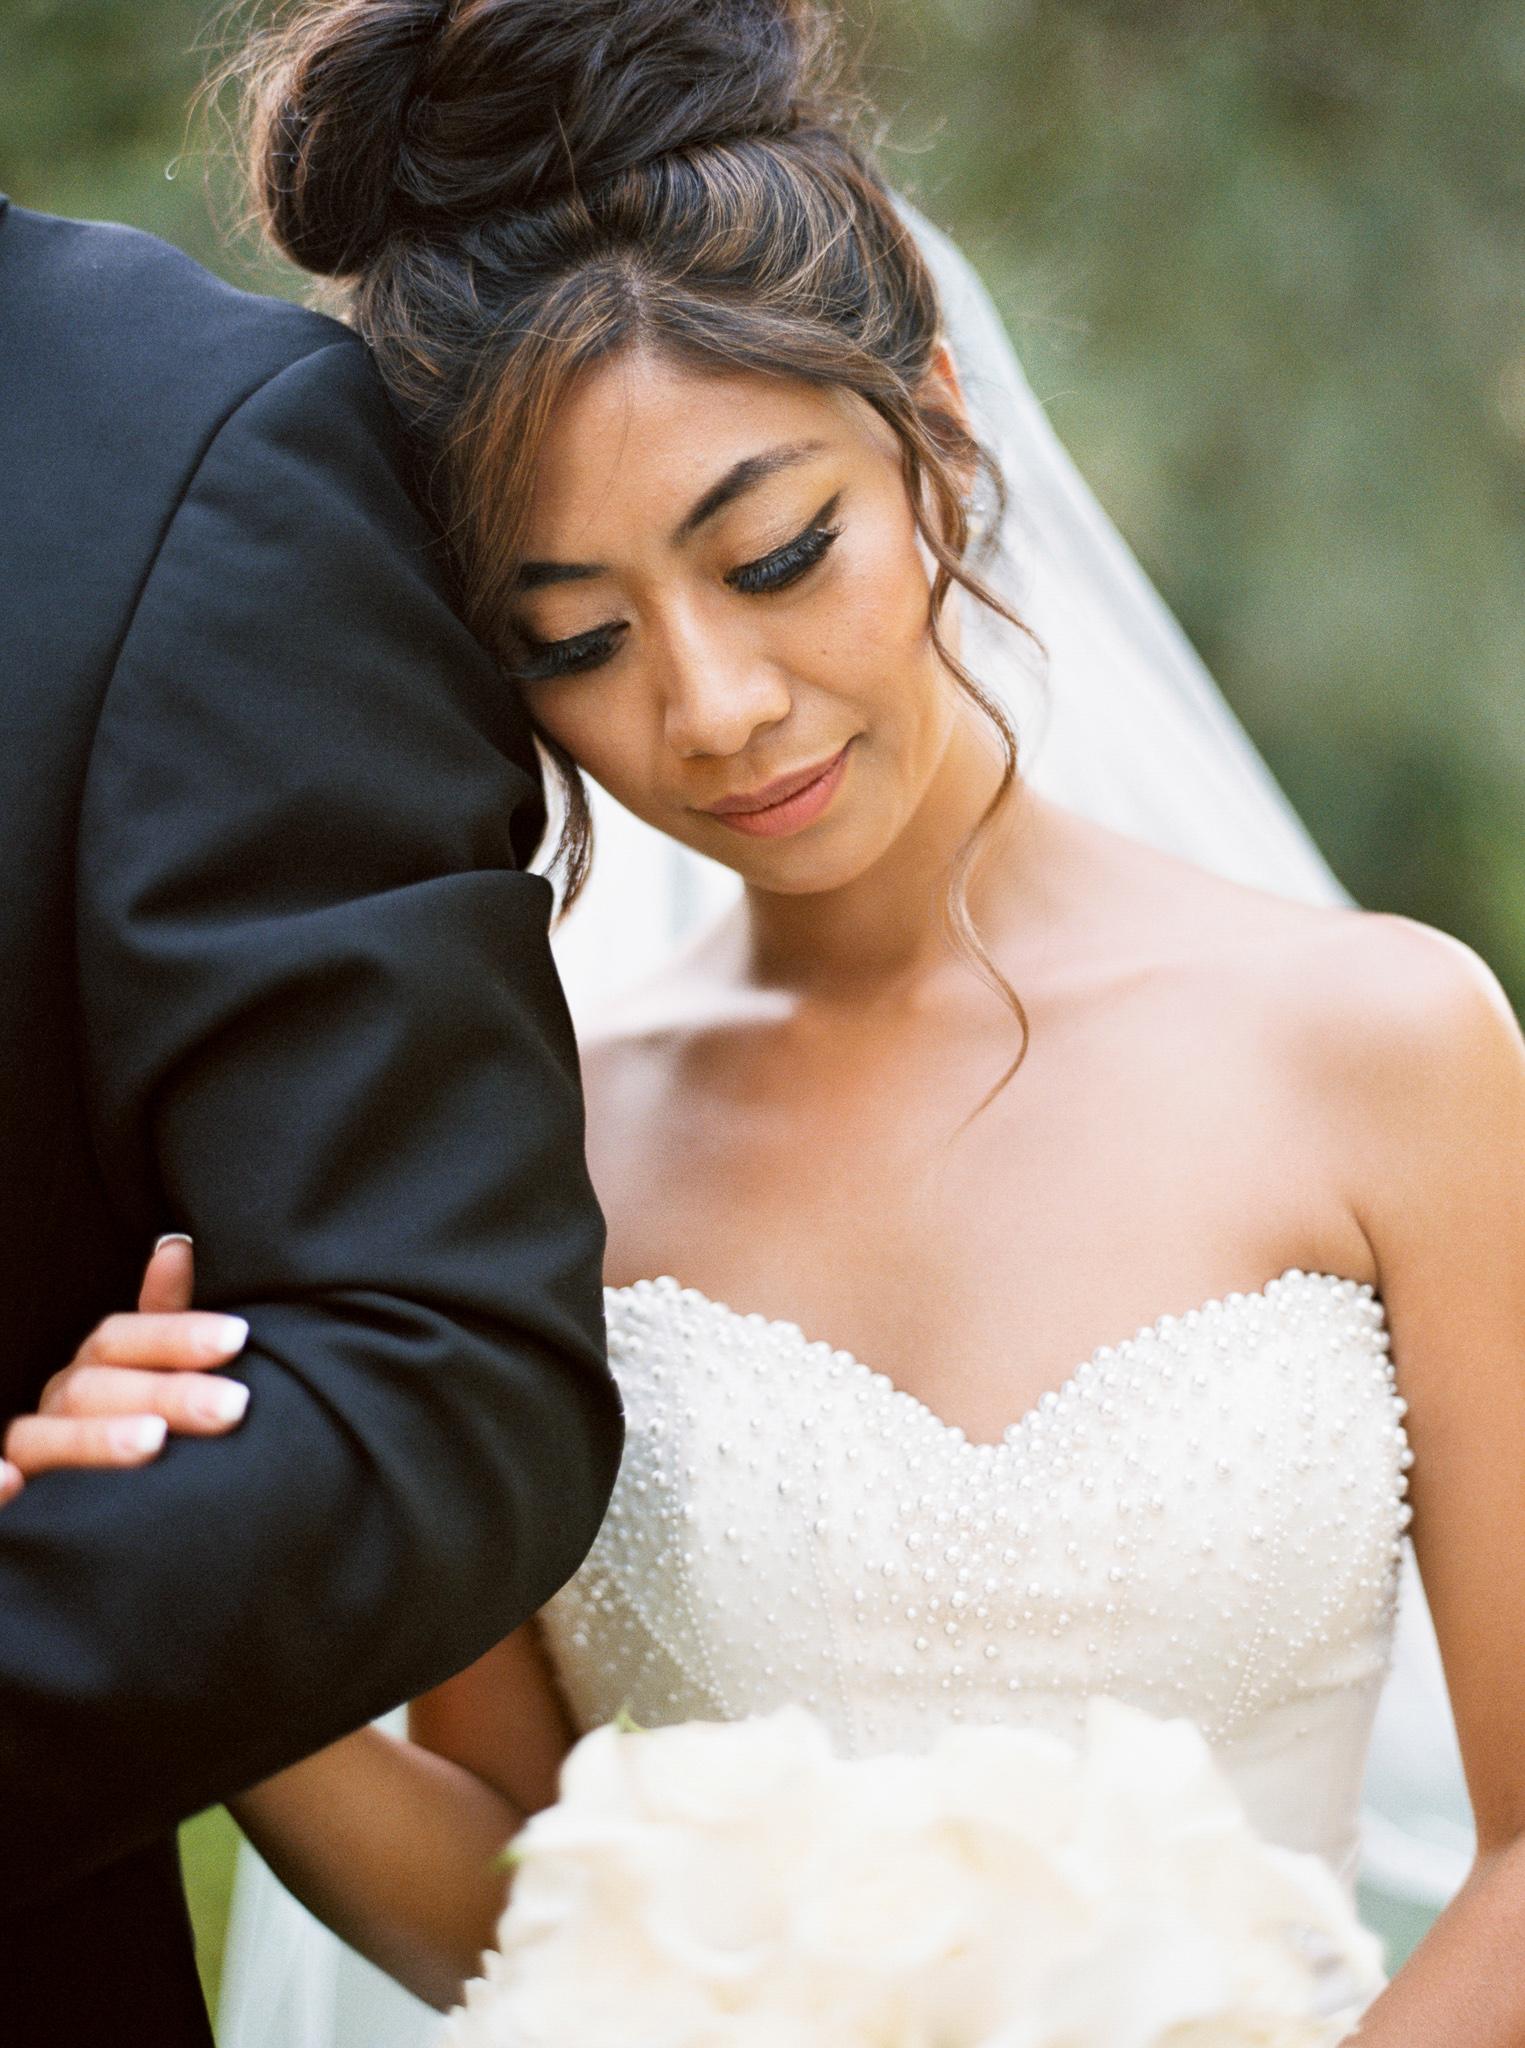 109OutliveCreative_Travel_Photographer_Videographer_Lewis&Clark_Oregon_Elegant_BlackTie_Destination_Wedding.jpg